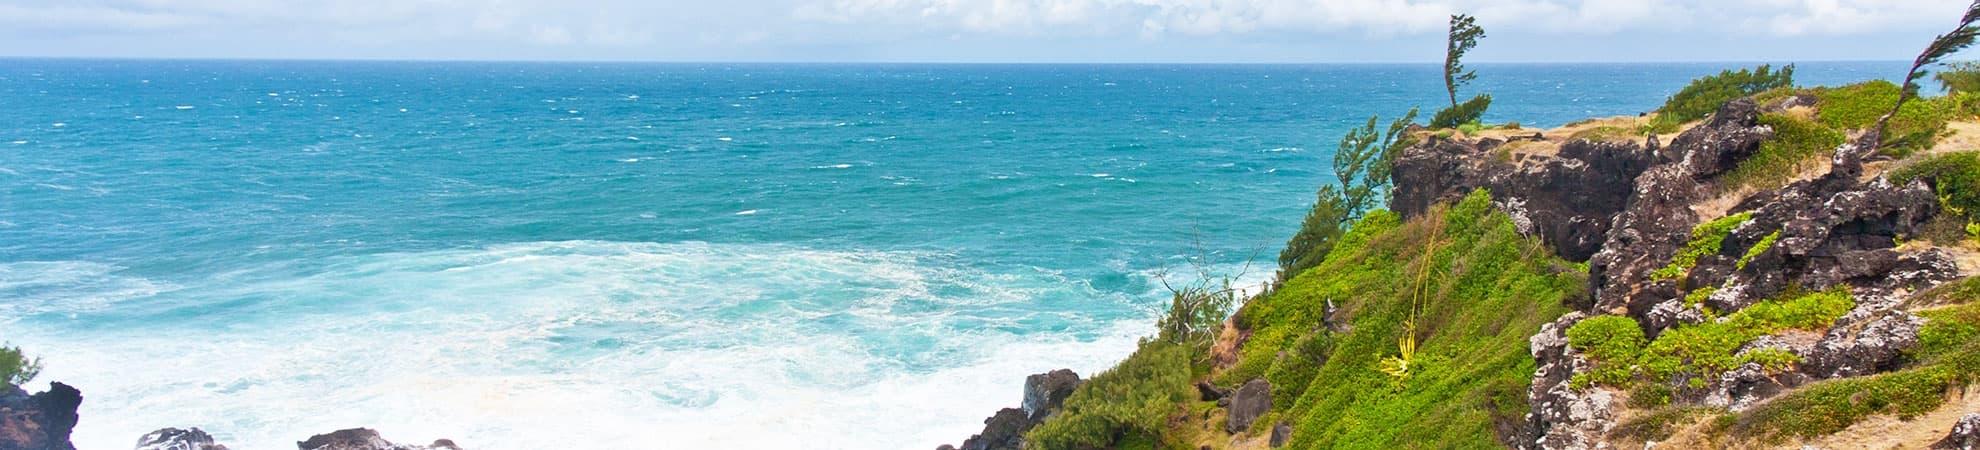 Voyage La Reunion